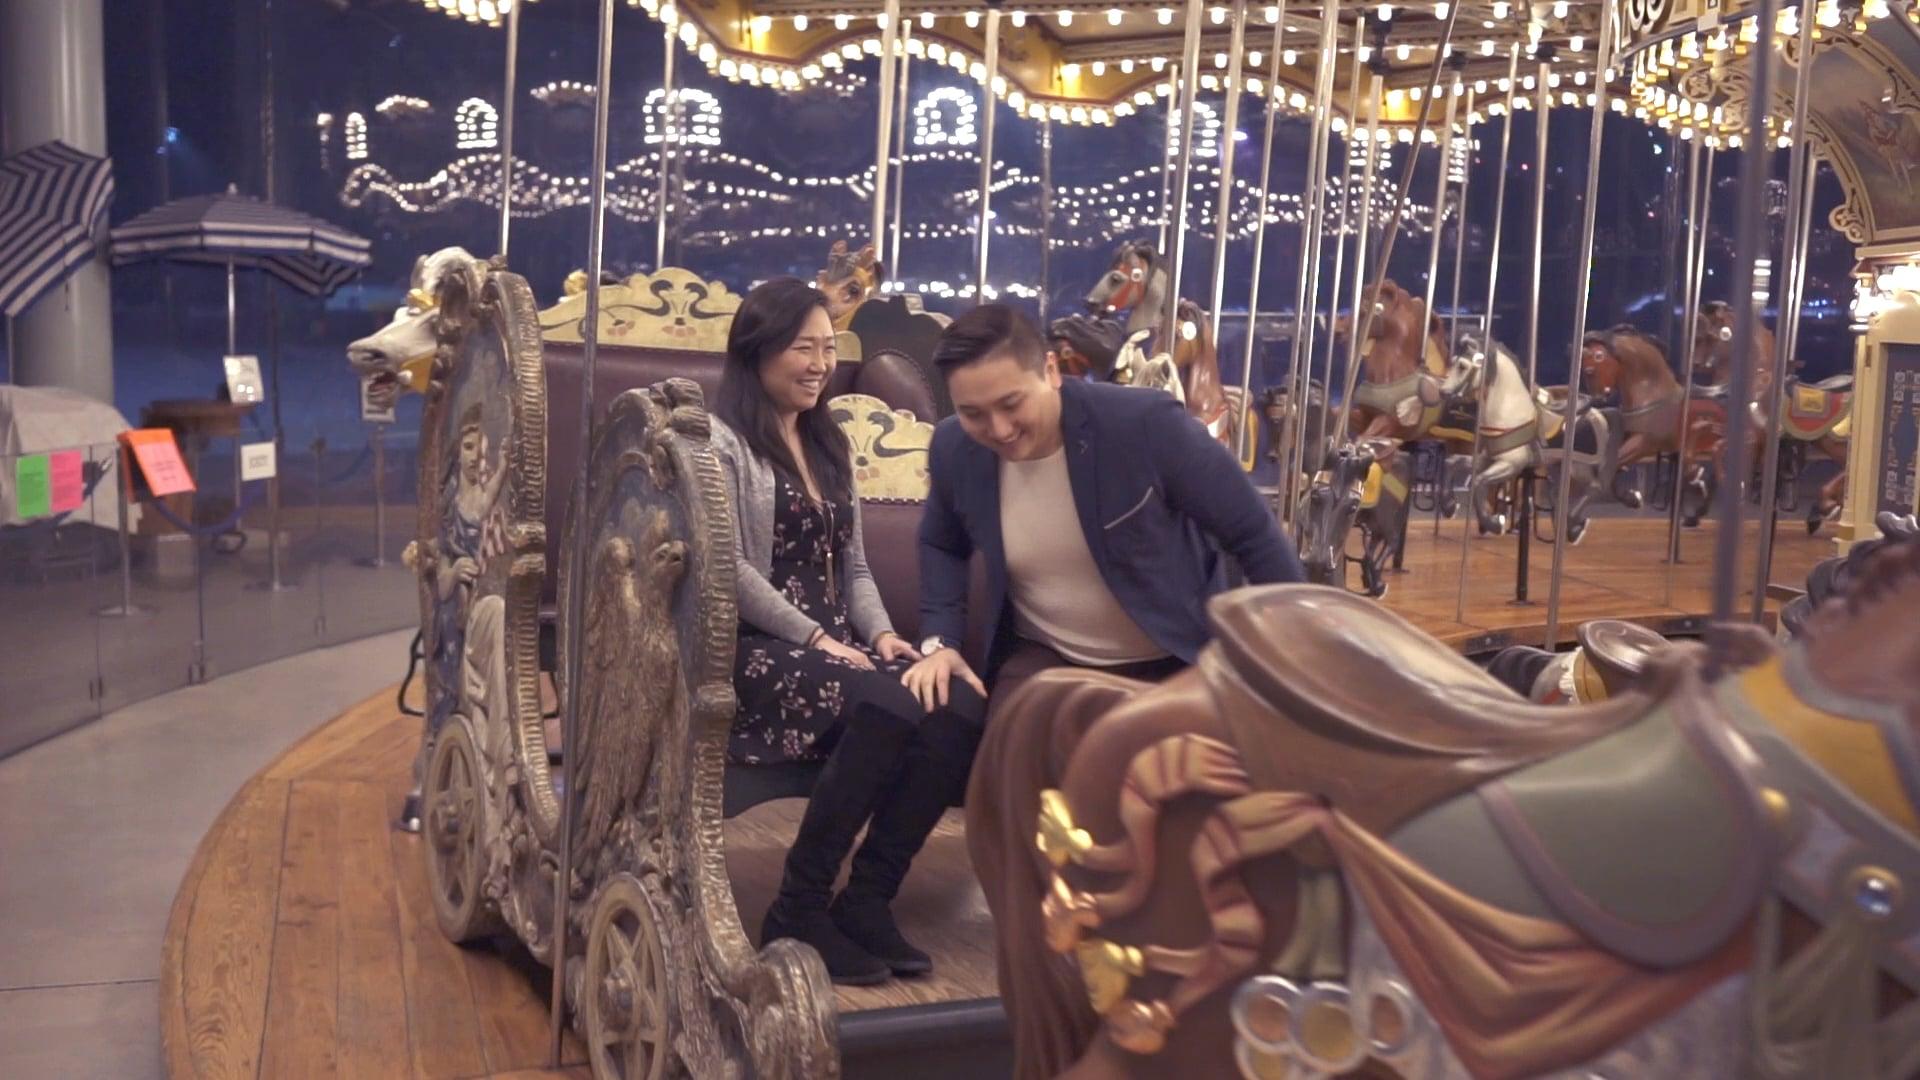 Proposal In Dumbo NYC- Jane's Carousel